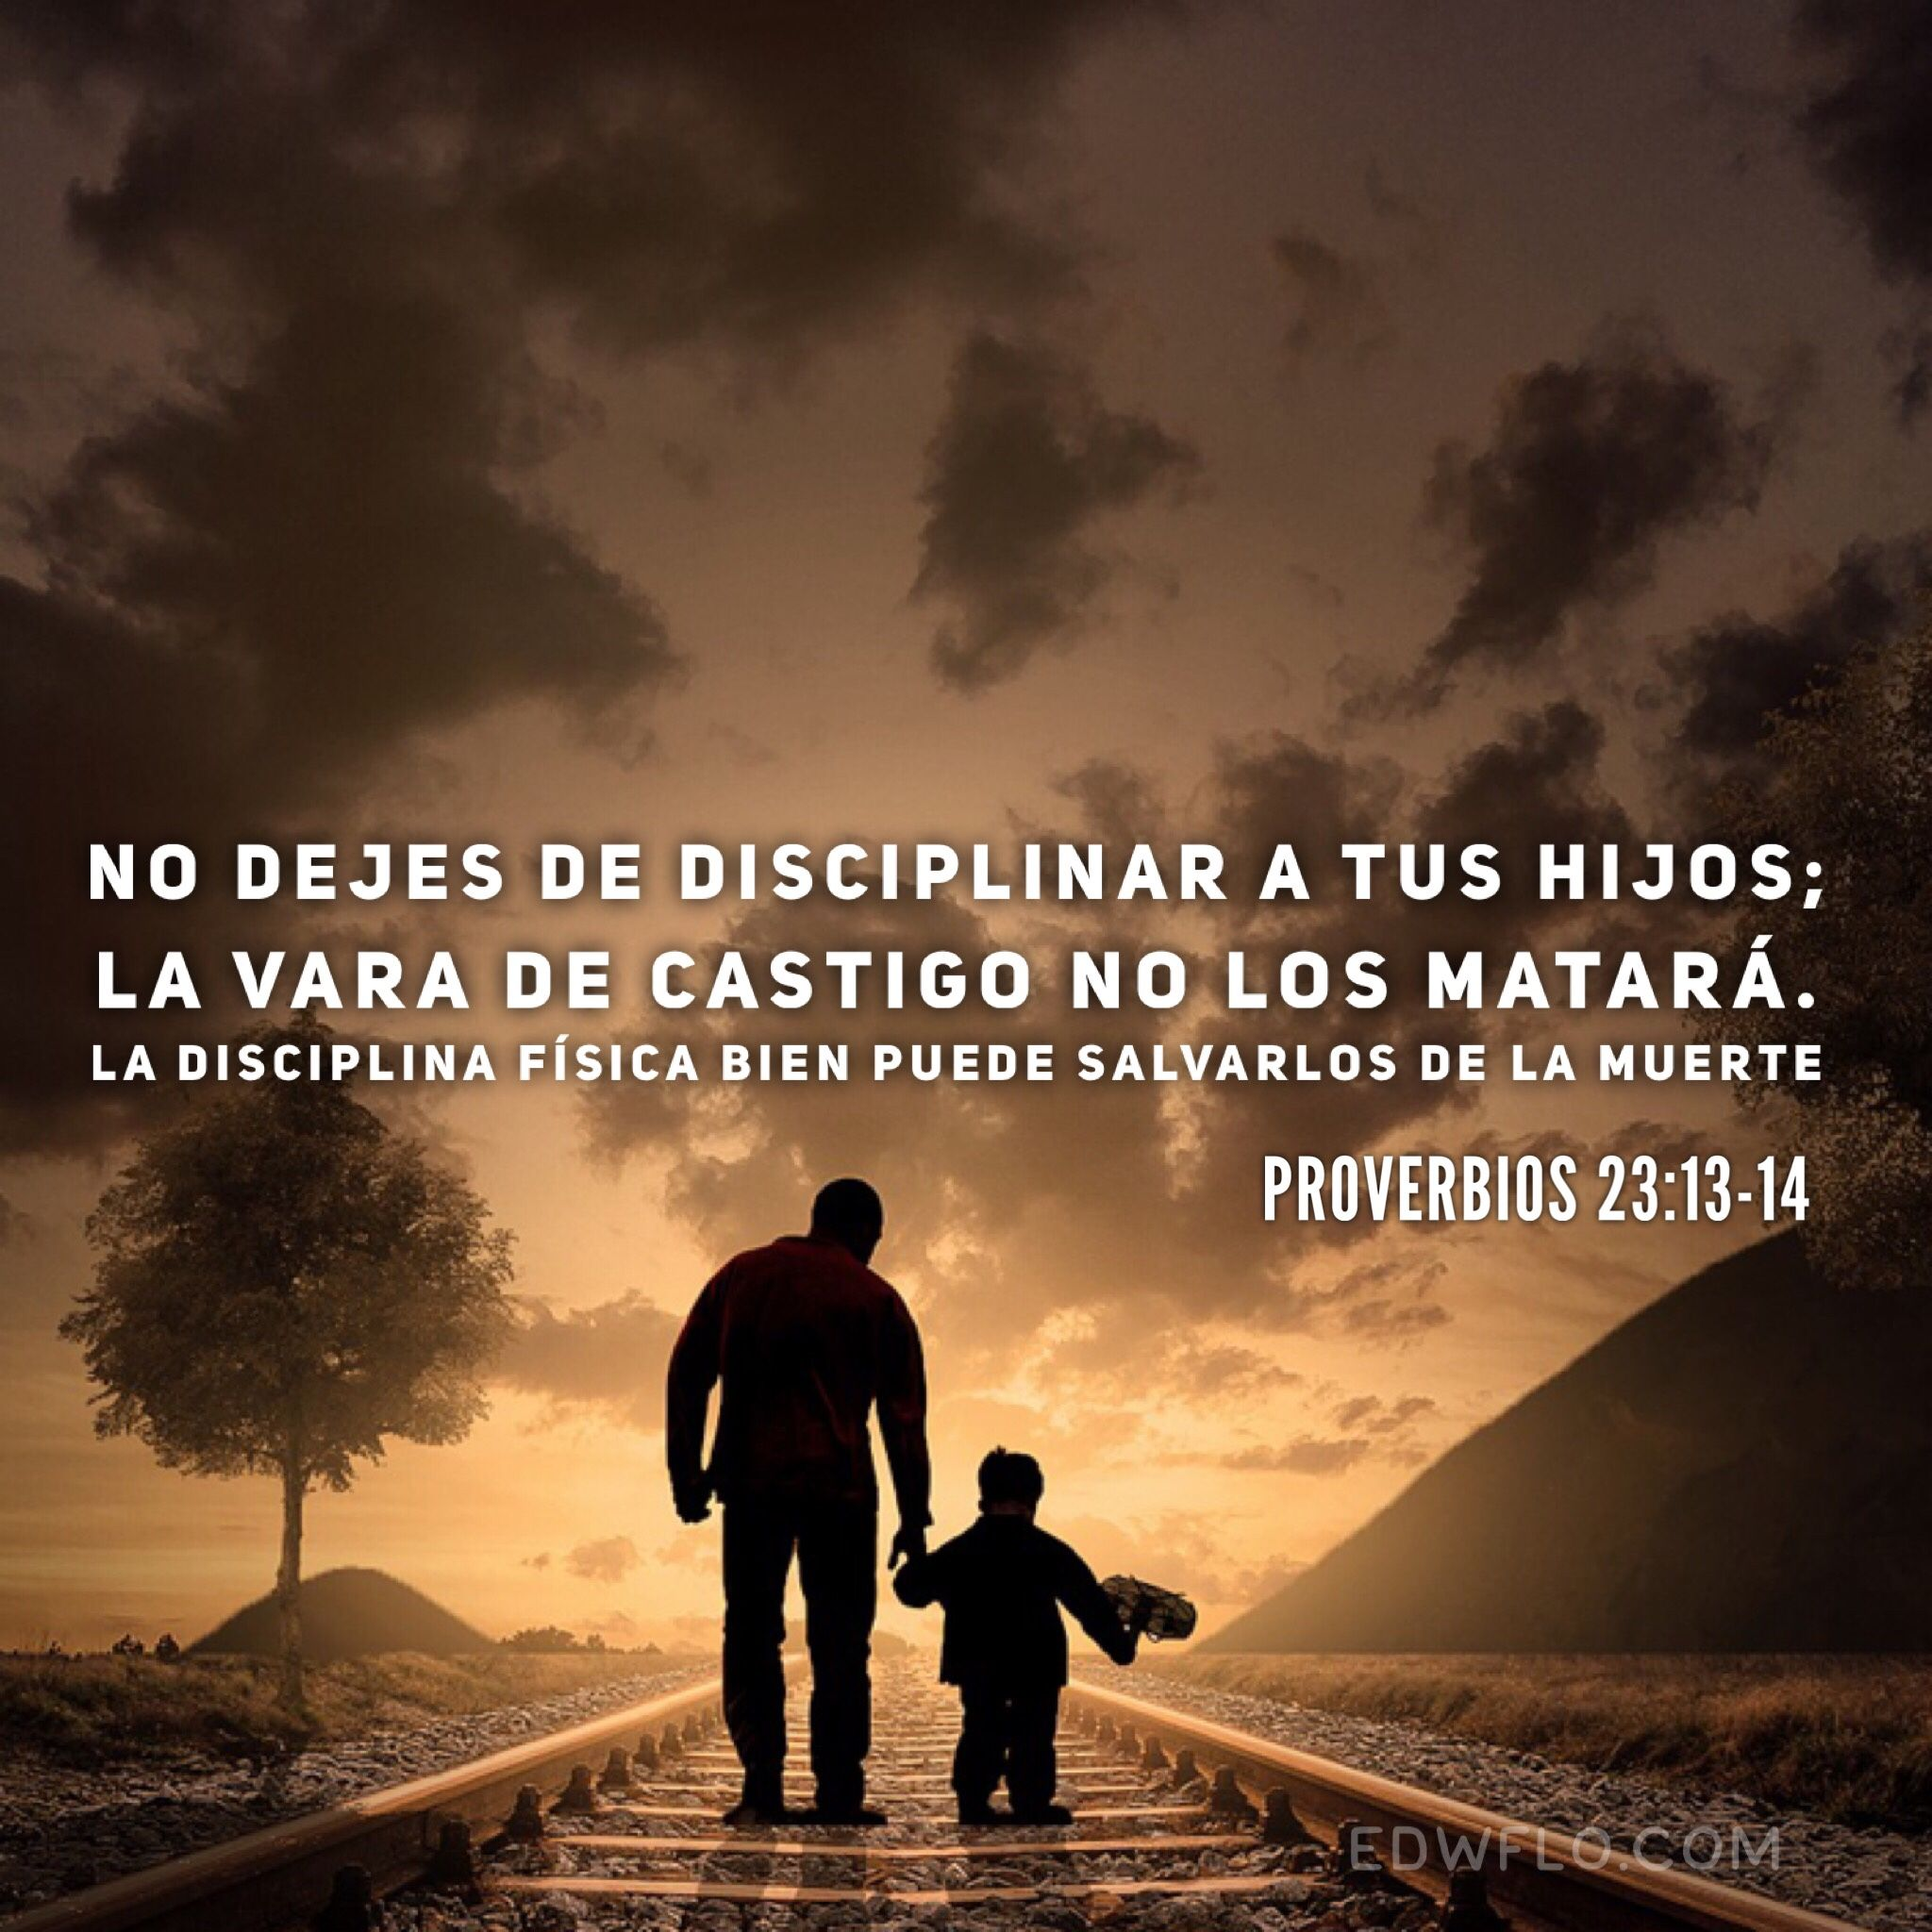 Proverbios 23 13 14 Biblia Proverbios Proverbios Proverbios Biblicos